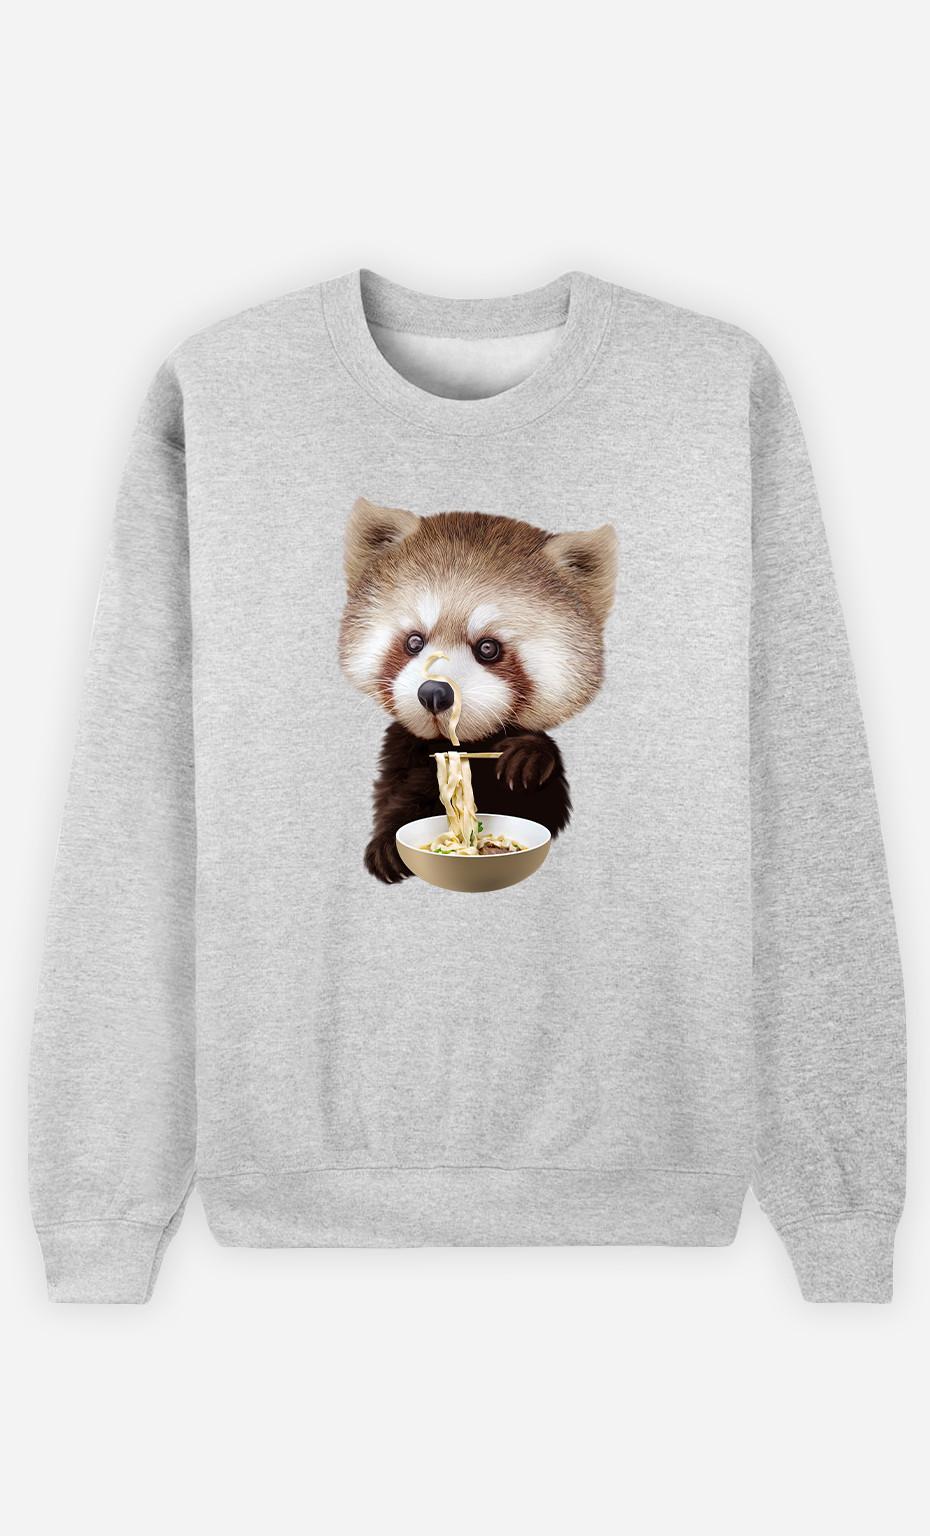 Man Sweatshirt Red Panda Loves Noodles